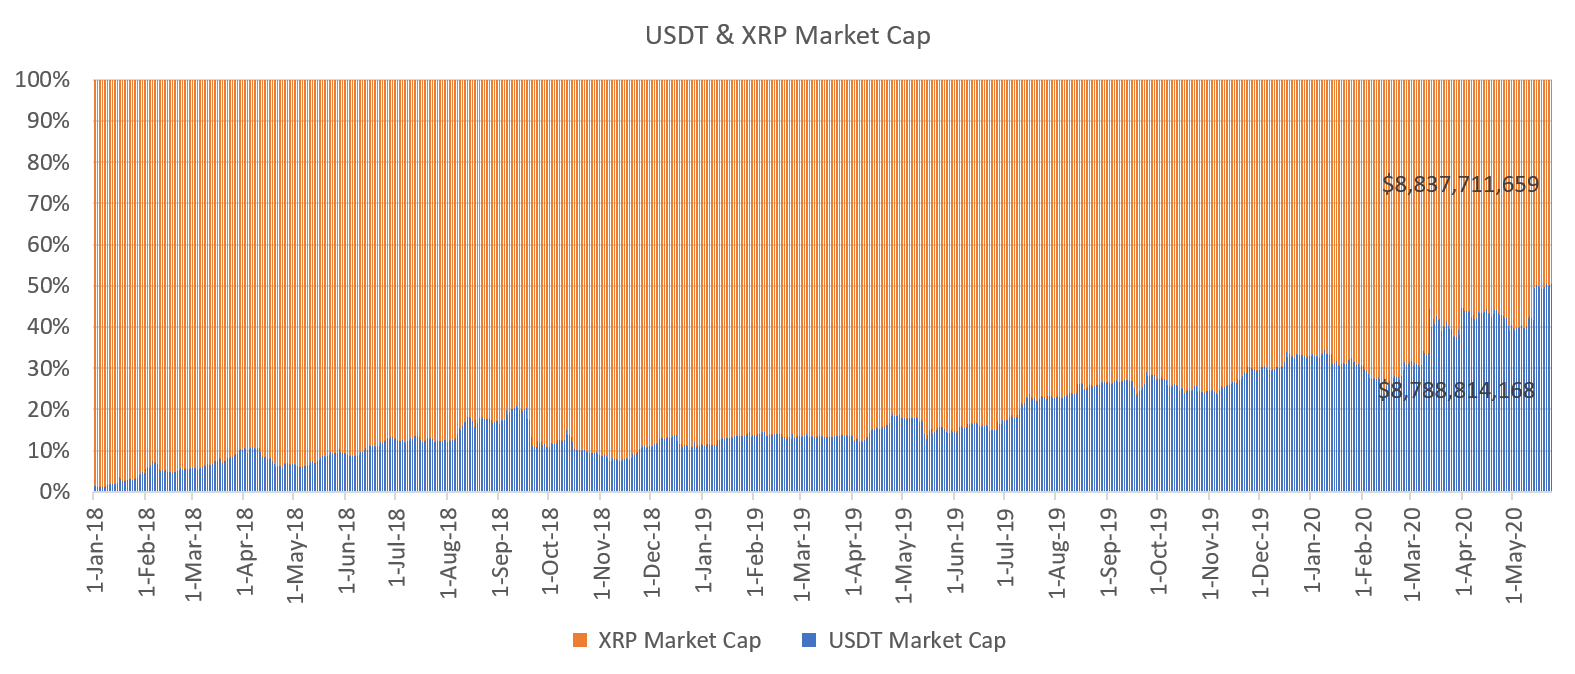 USDT vs. XRP market capitalization. Source: Cointelegraph, CoinMarketCap